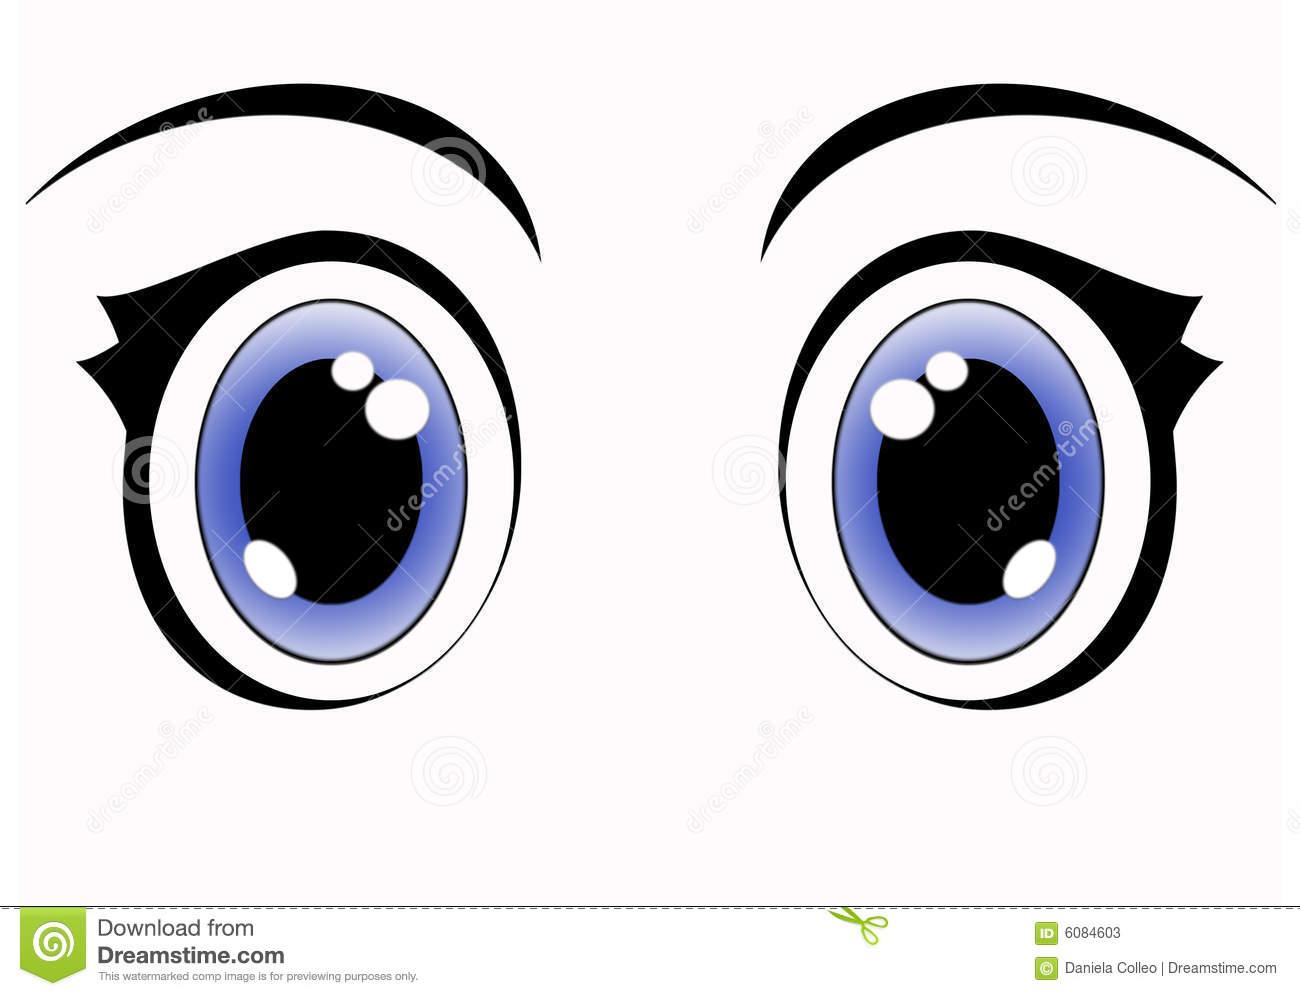 Blue anime eyes stock illustration. Illustration of clipart.